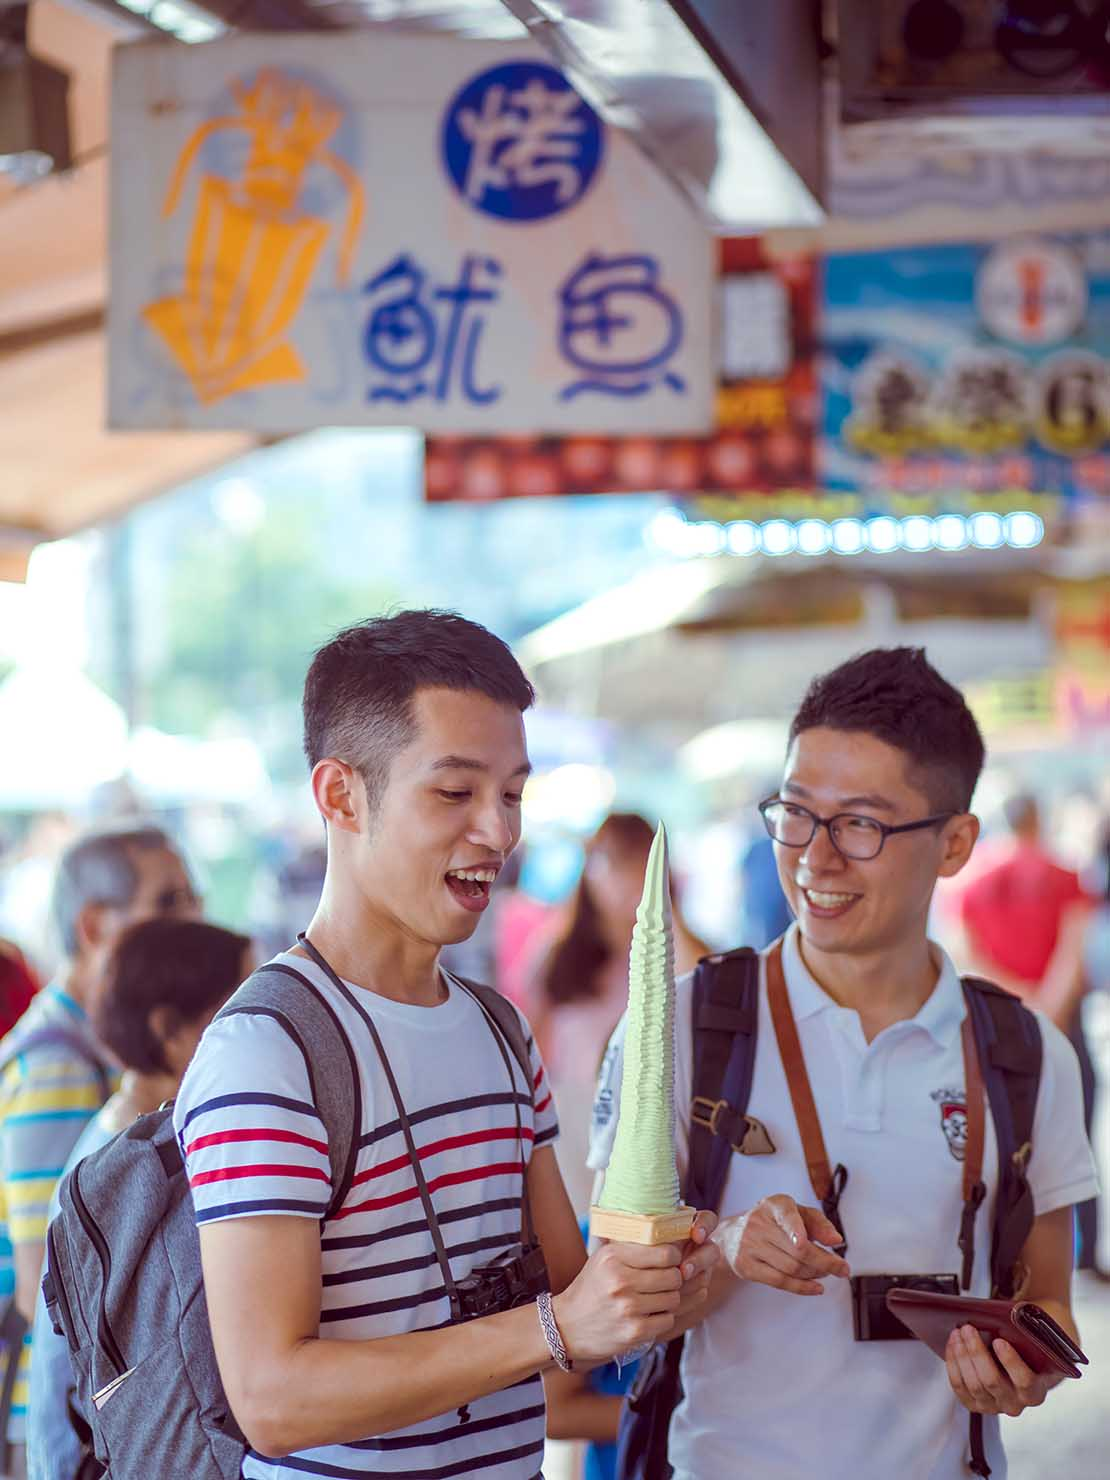 KKday台湾旅行・出張撮影サービス撮影サンプル(ソフトクリームを買う2人)